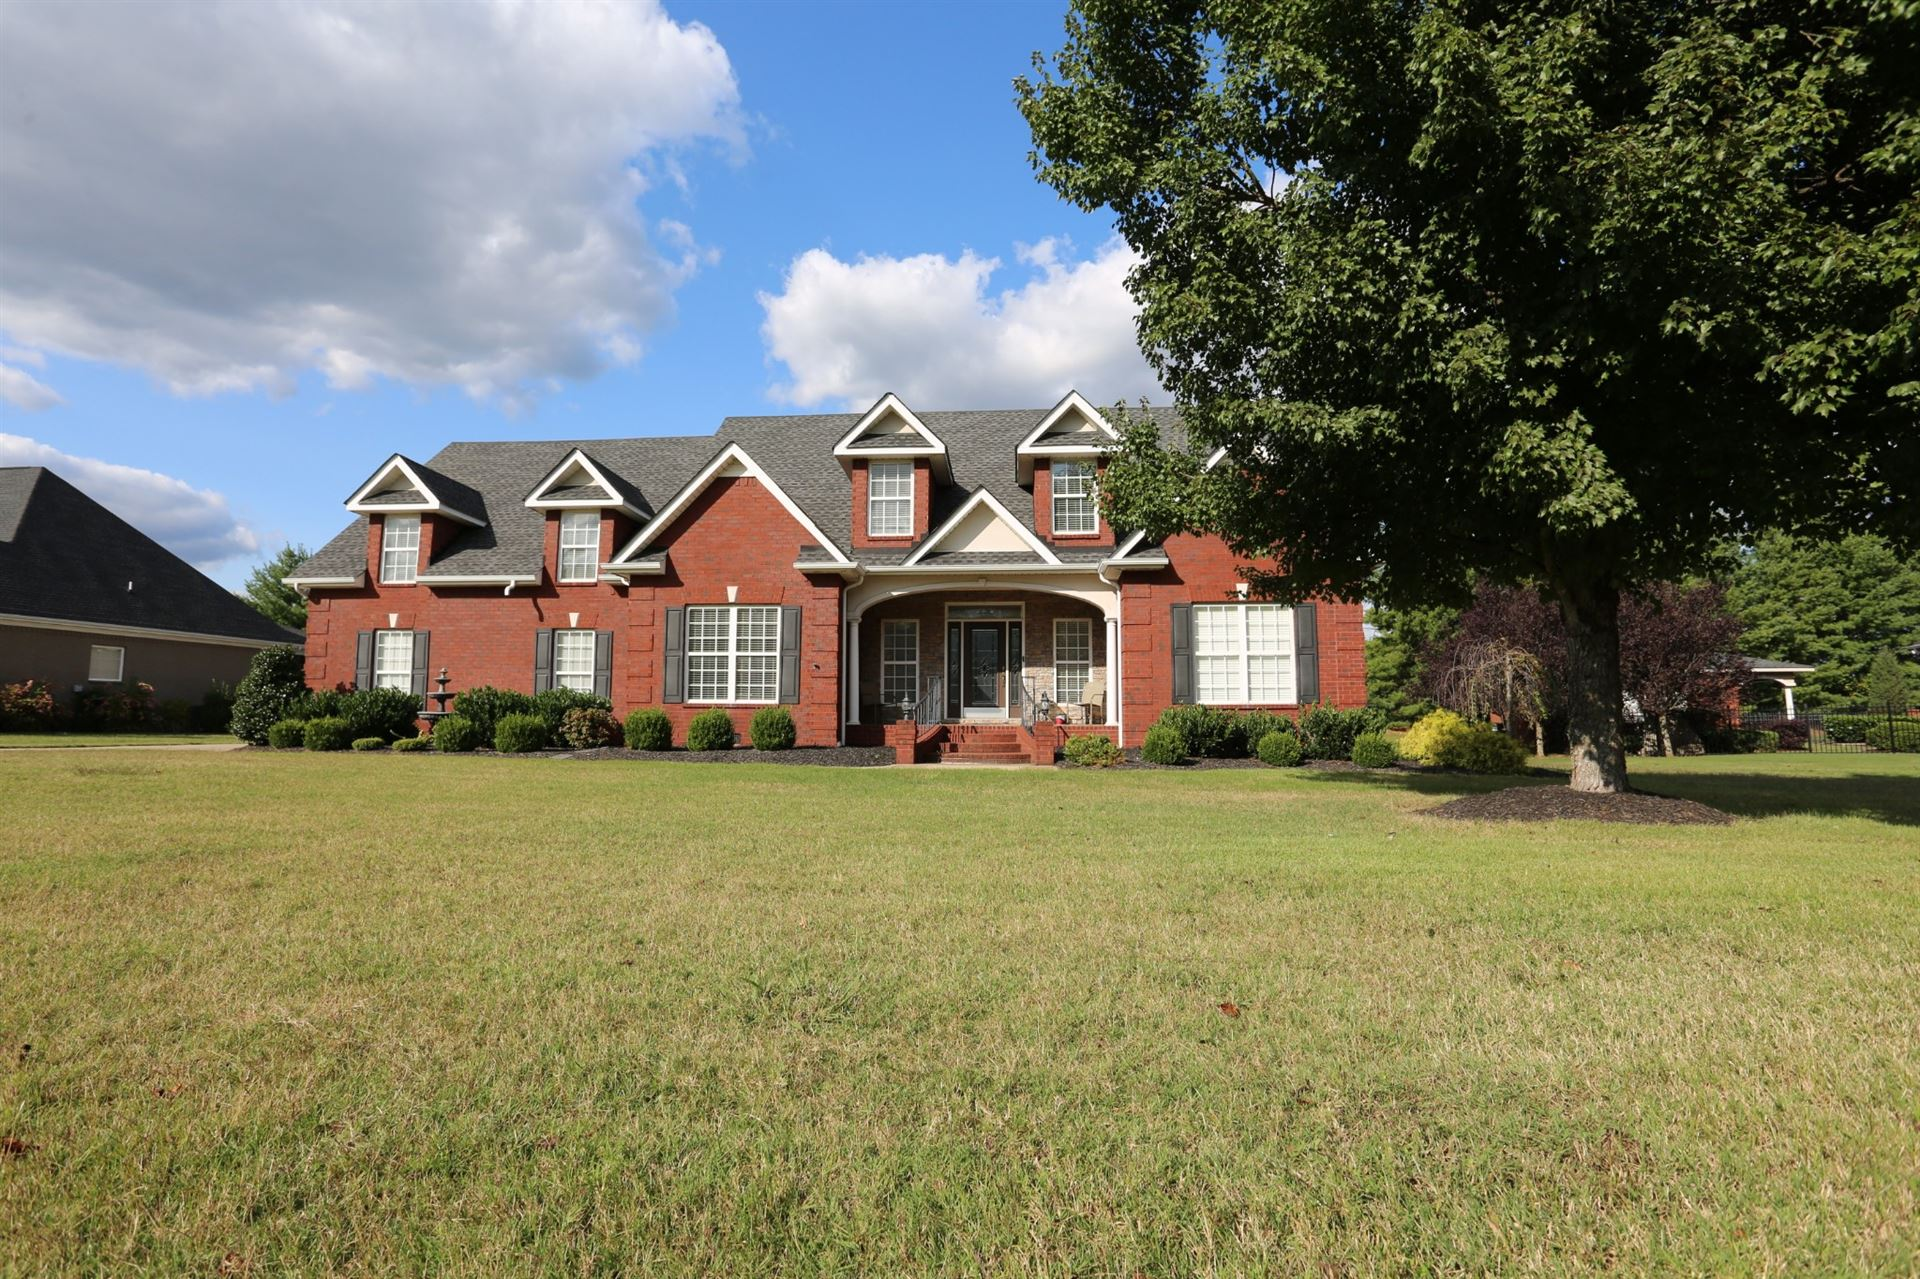 1527 Anatole Ct, Murfreesboro, TN 37130 - MLS#: 2200831